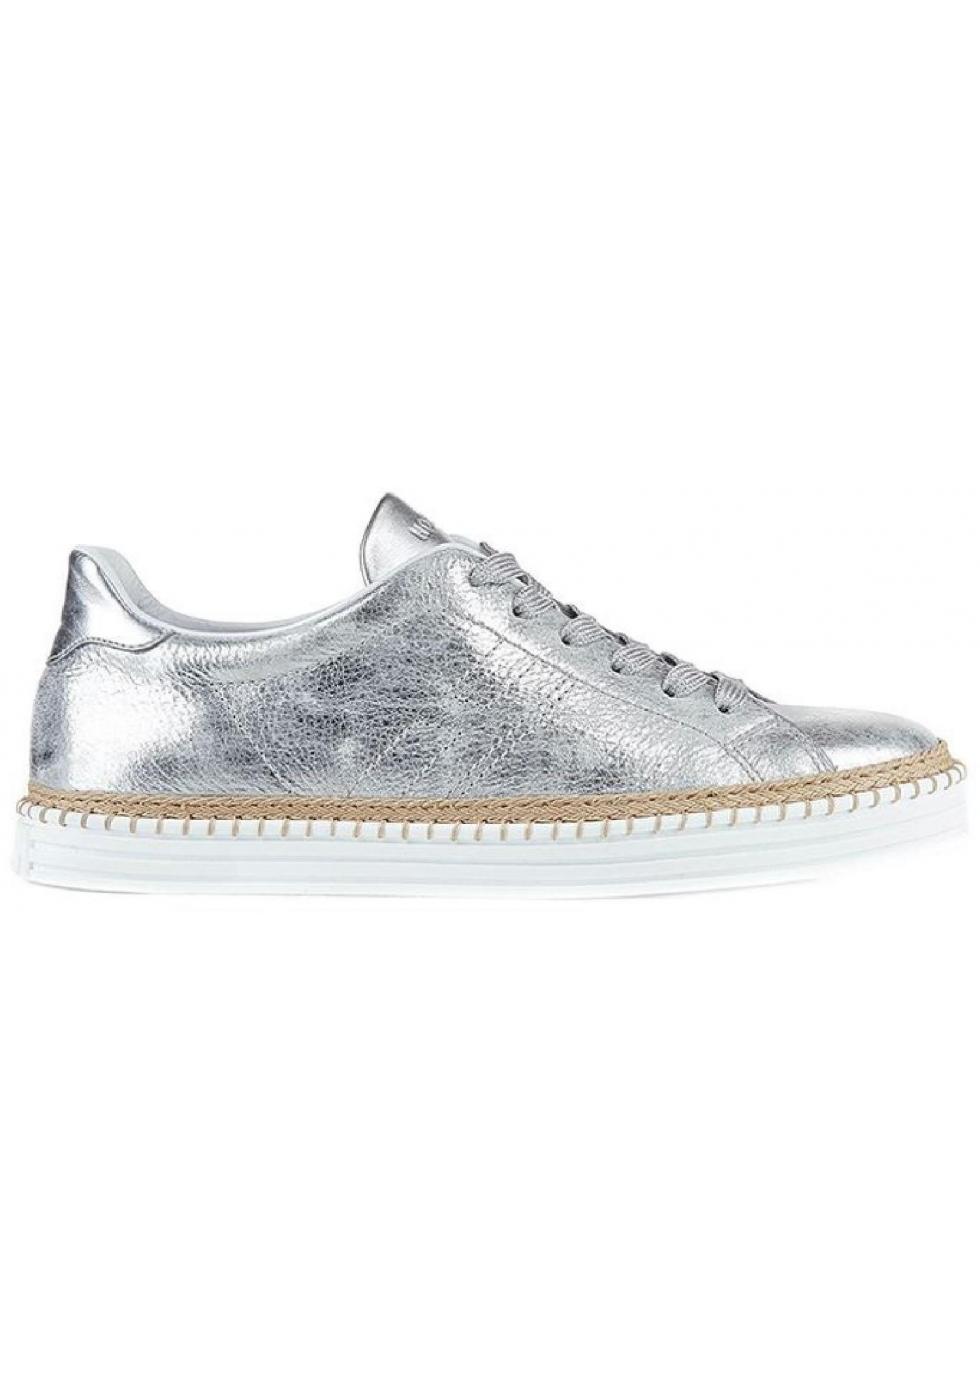 silver metallic leather - Italian Boutique